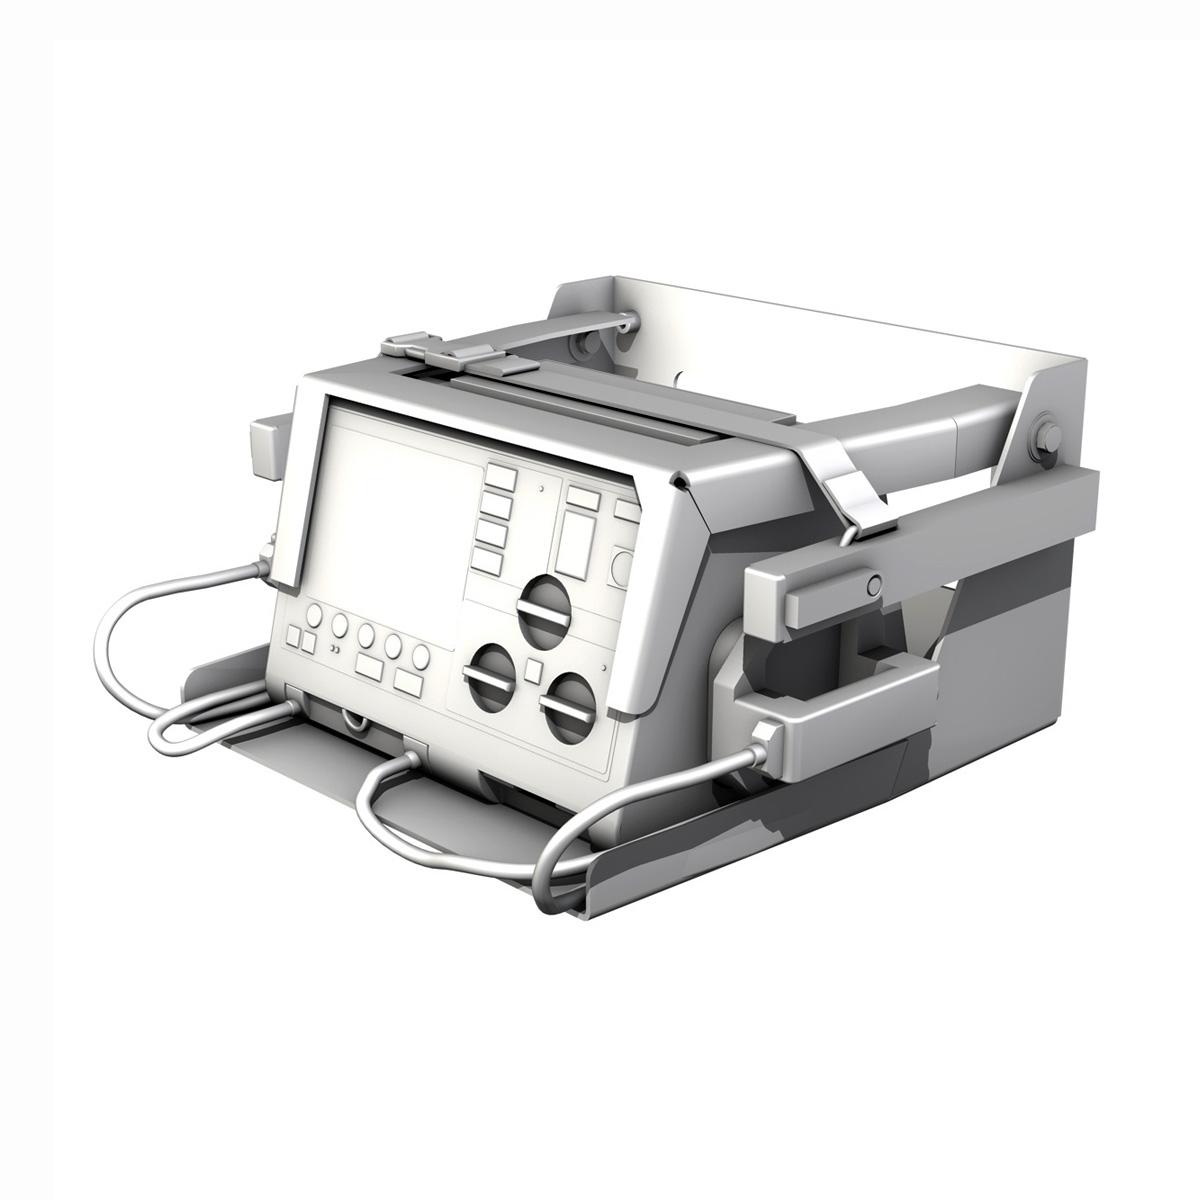 defibrillator 3d model 3ds c4d lwo obj 264215